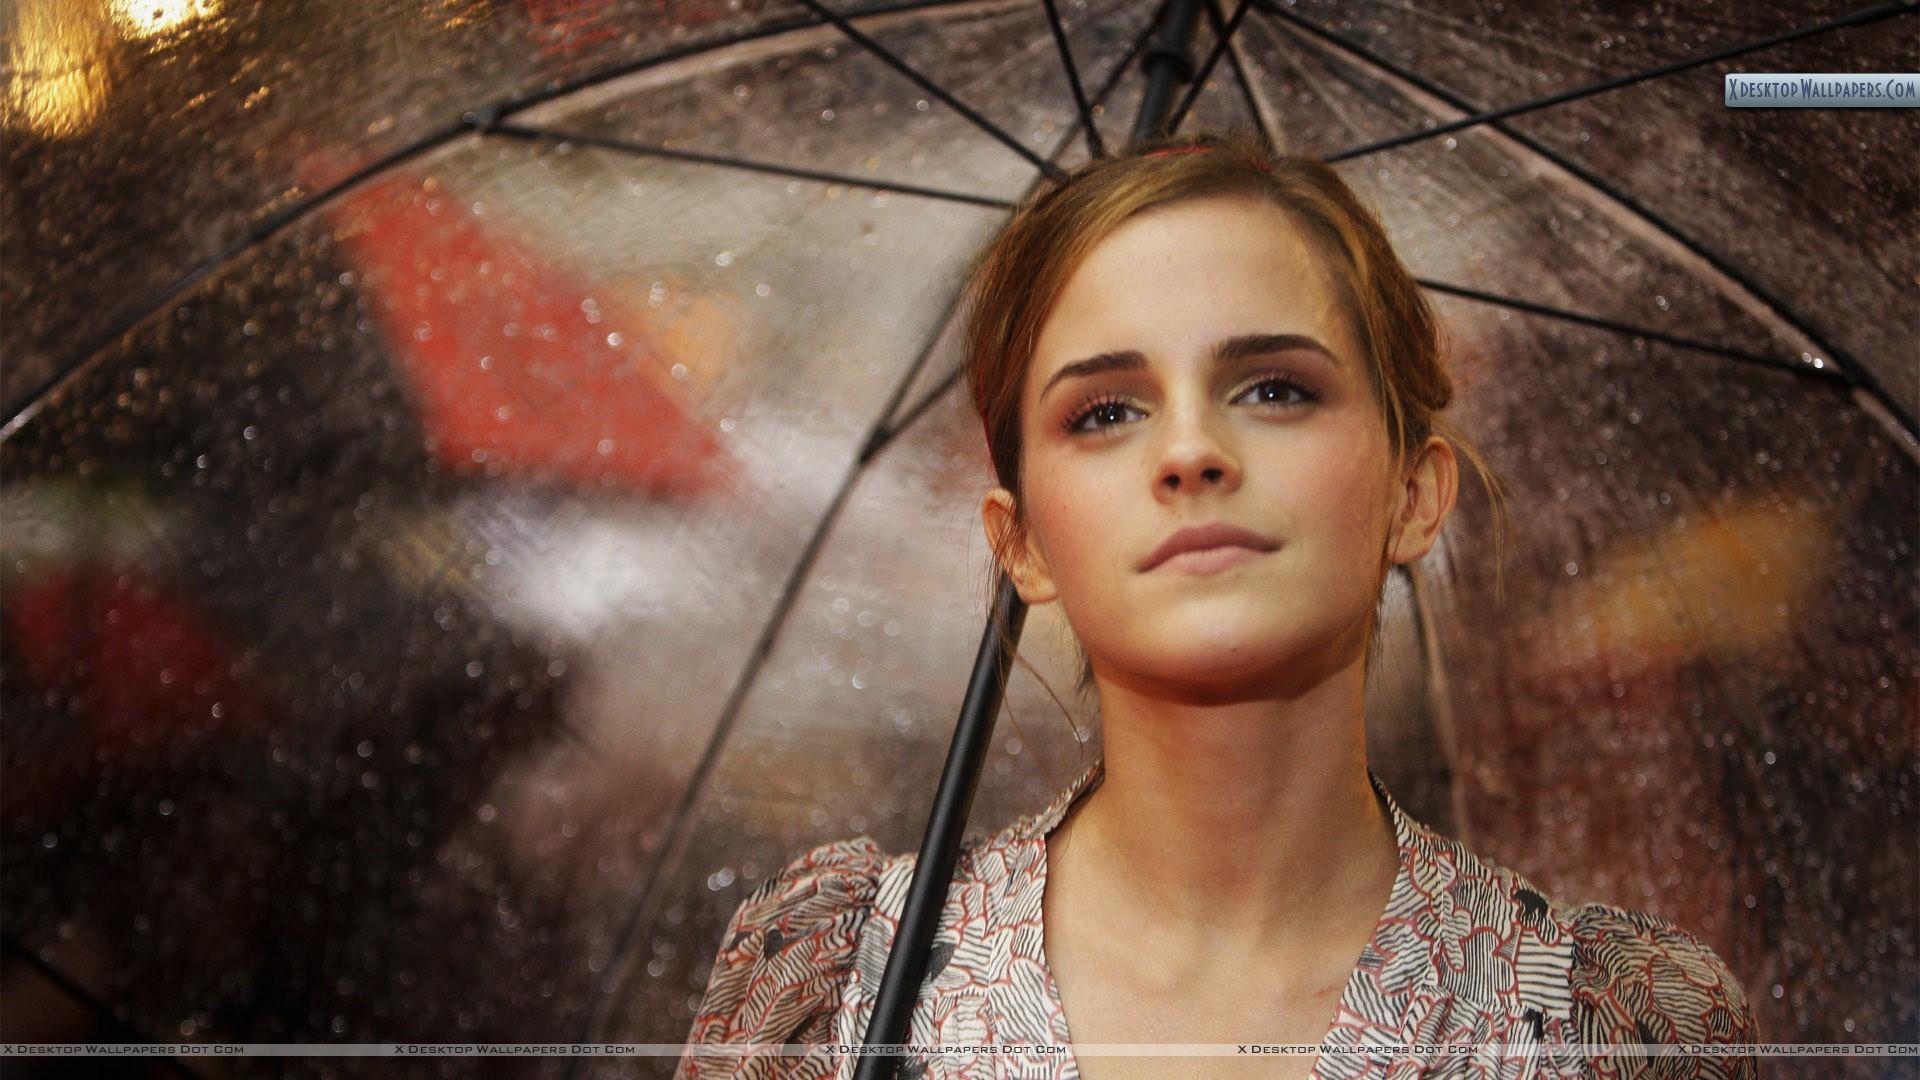 Emma Watson With Umbrella - Emma Watson , HD Wallpaper & Backgrounds